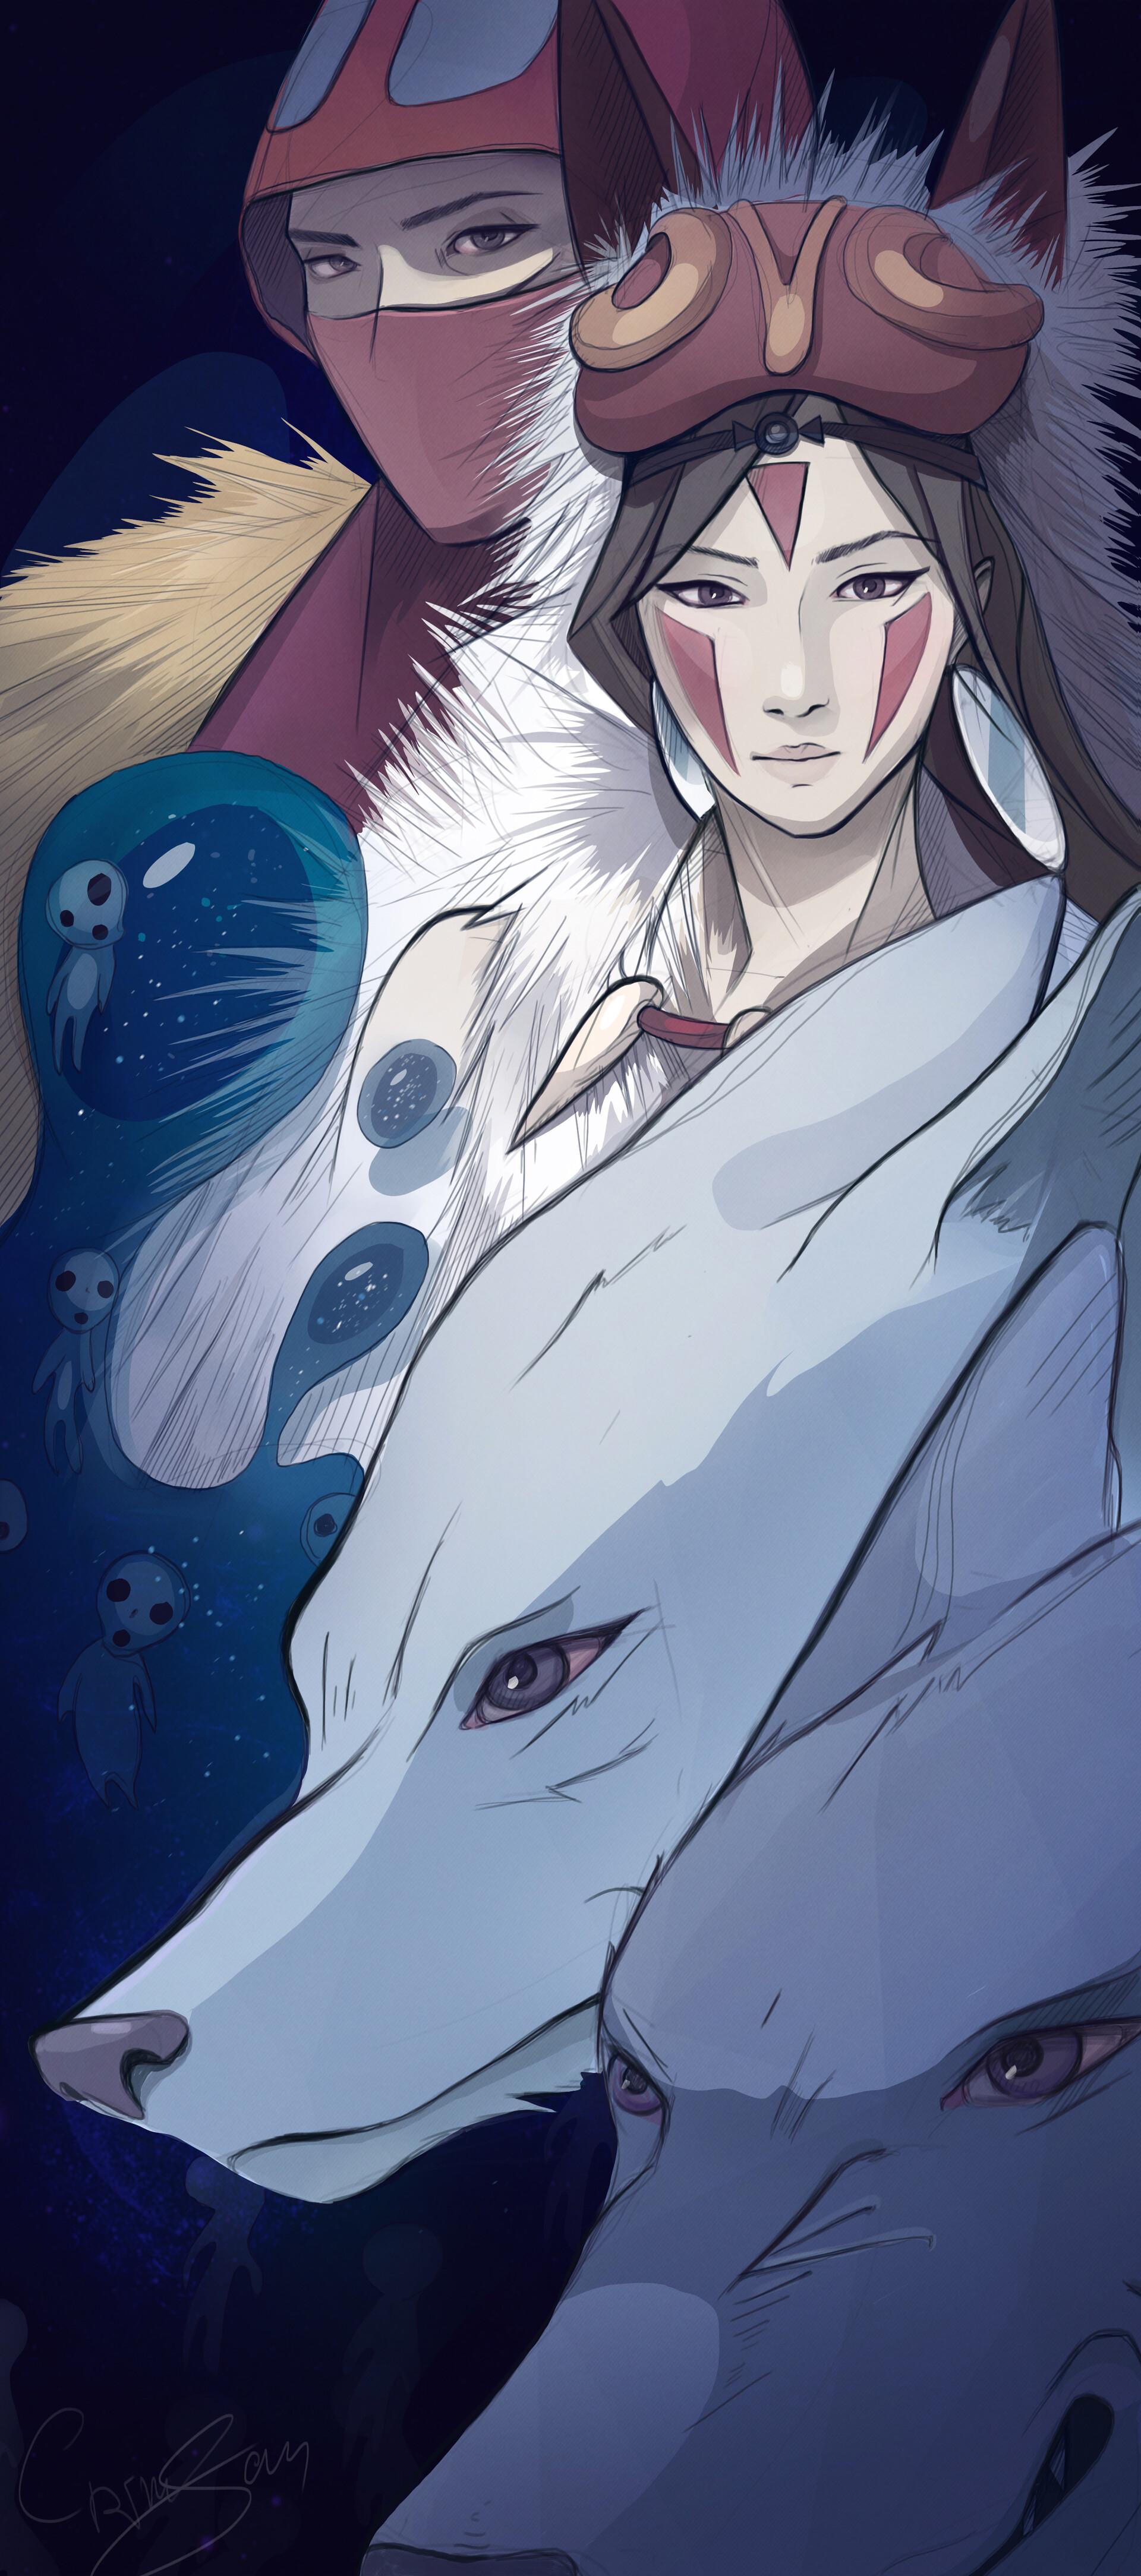 Mononoke Hime もののけ姫